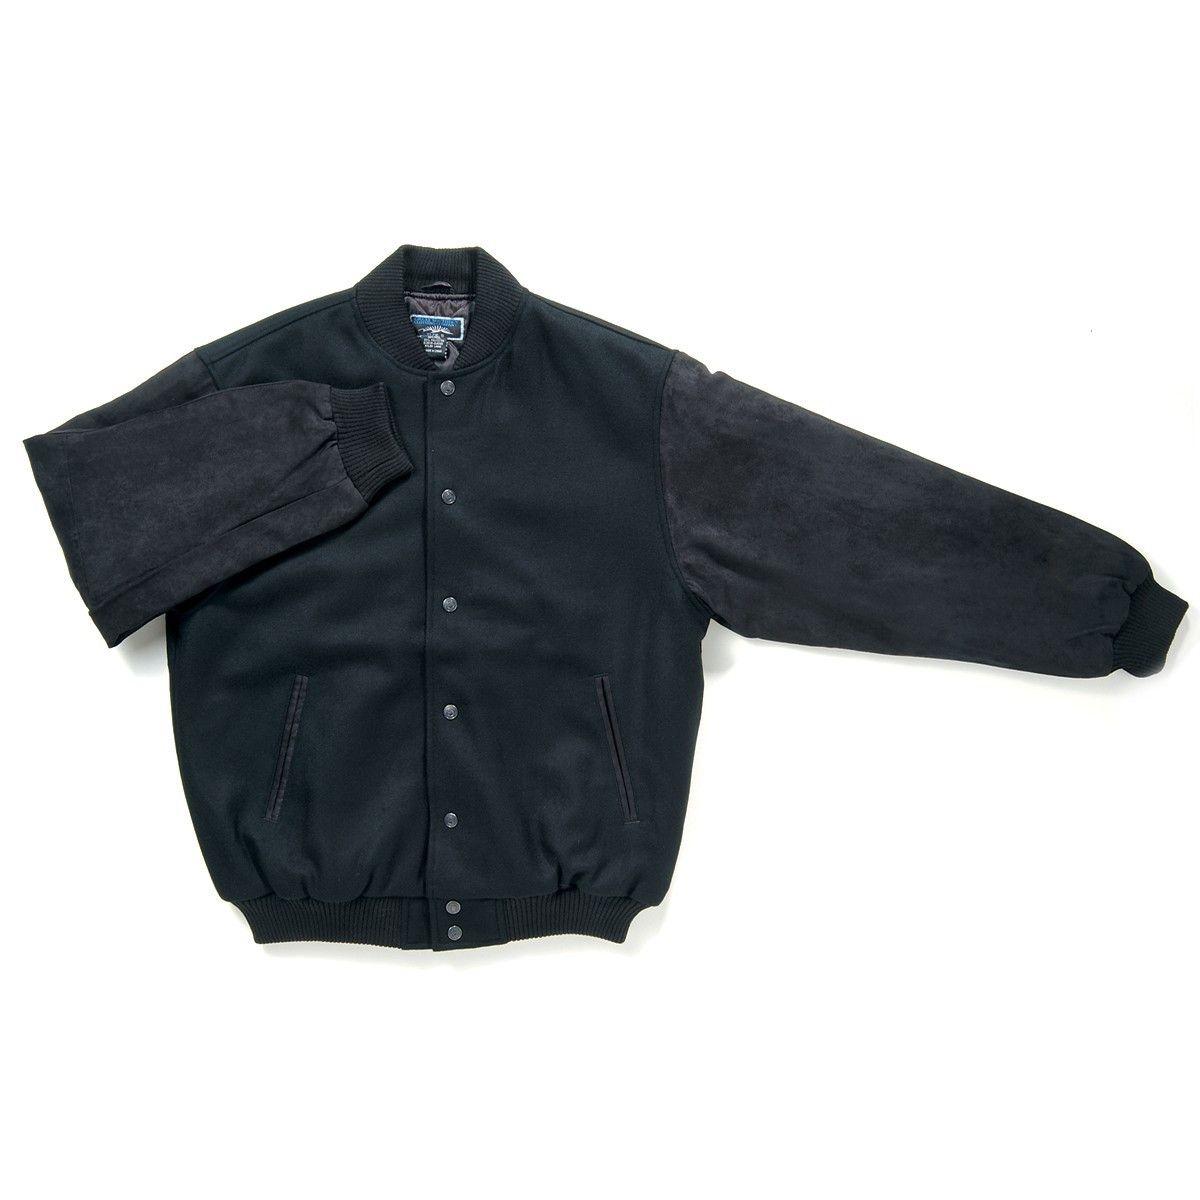 Code: J501 Name: Kosciusko Jacket J501 Size: 2XL|3XL|4XL|L|M|S|XL|XS Available Colours: Black,Black|Black,Tan|Navy,Navy|Navy,Tan Description: The contrast suede